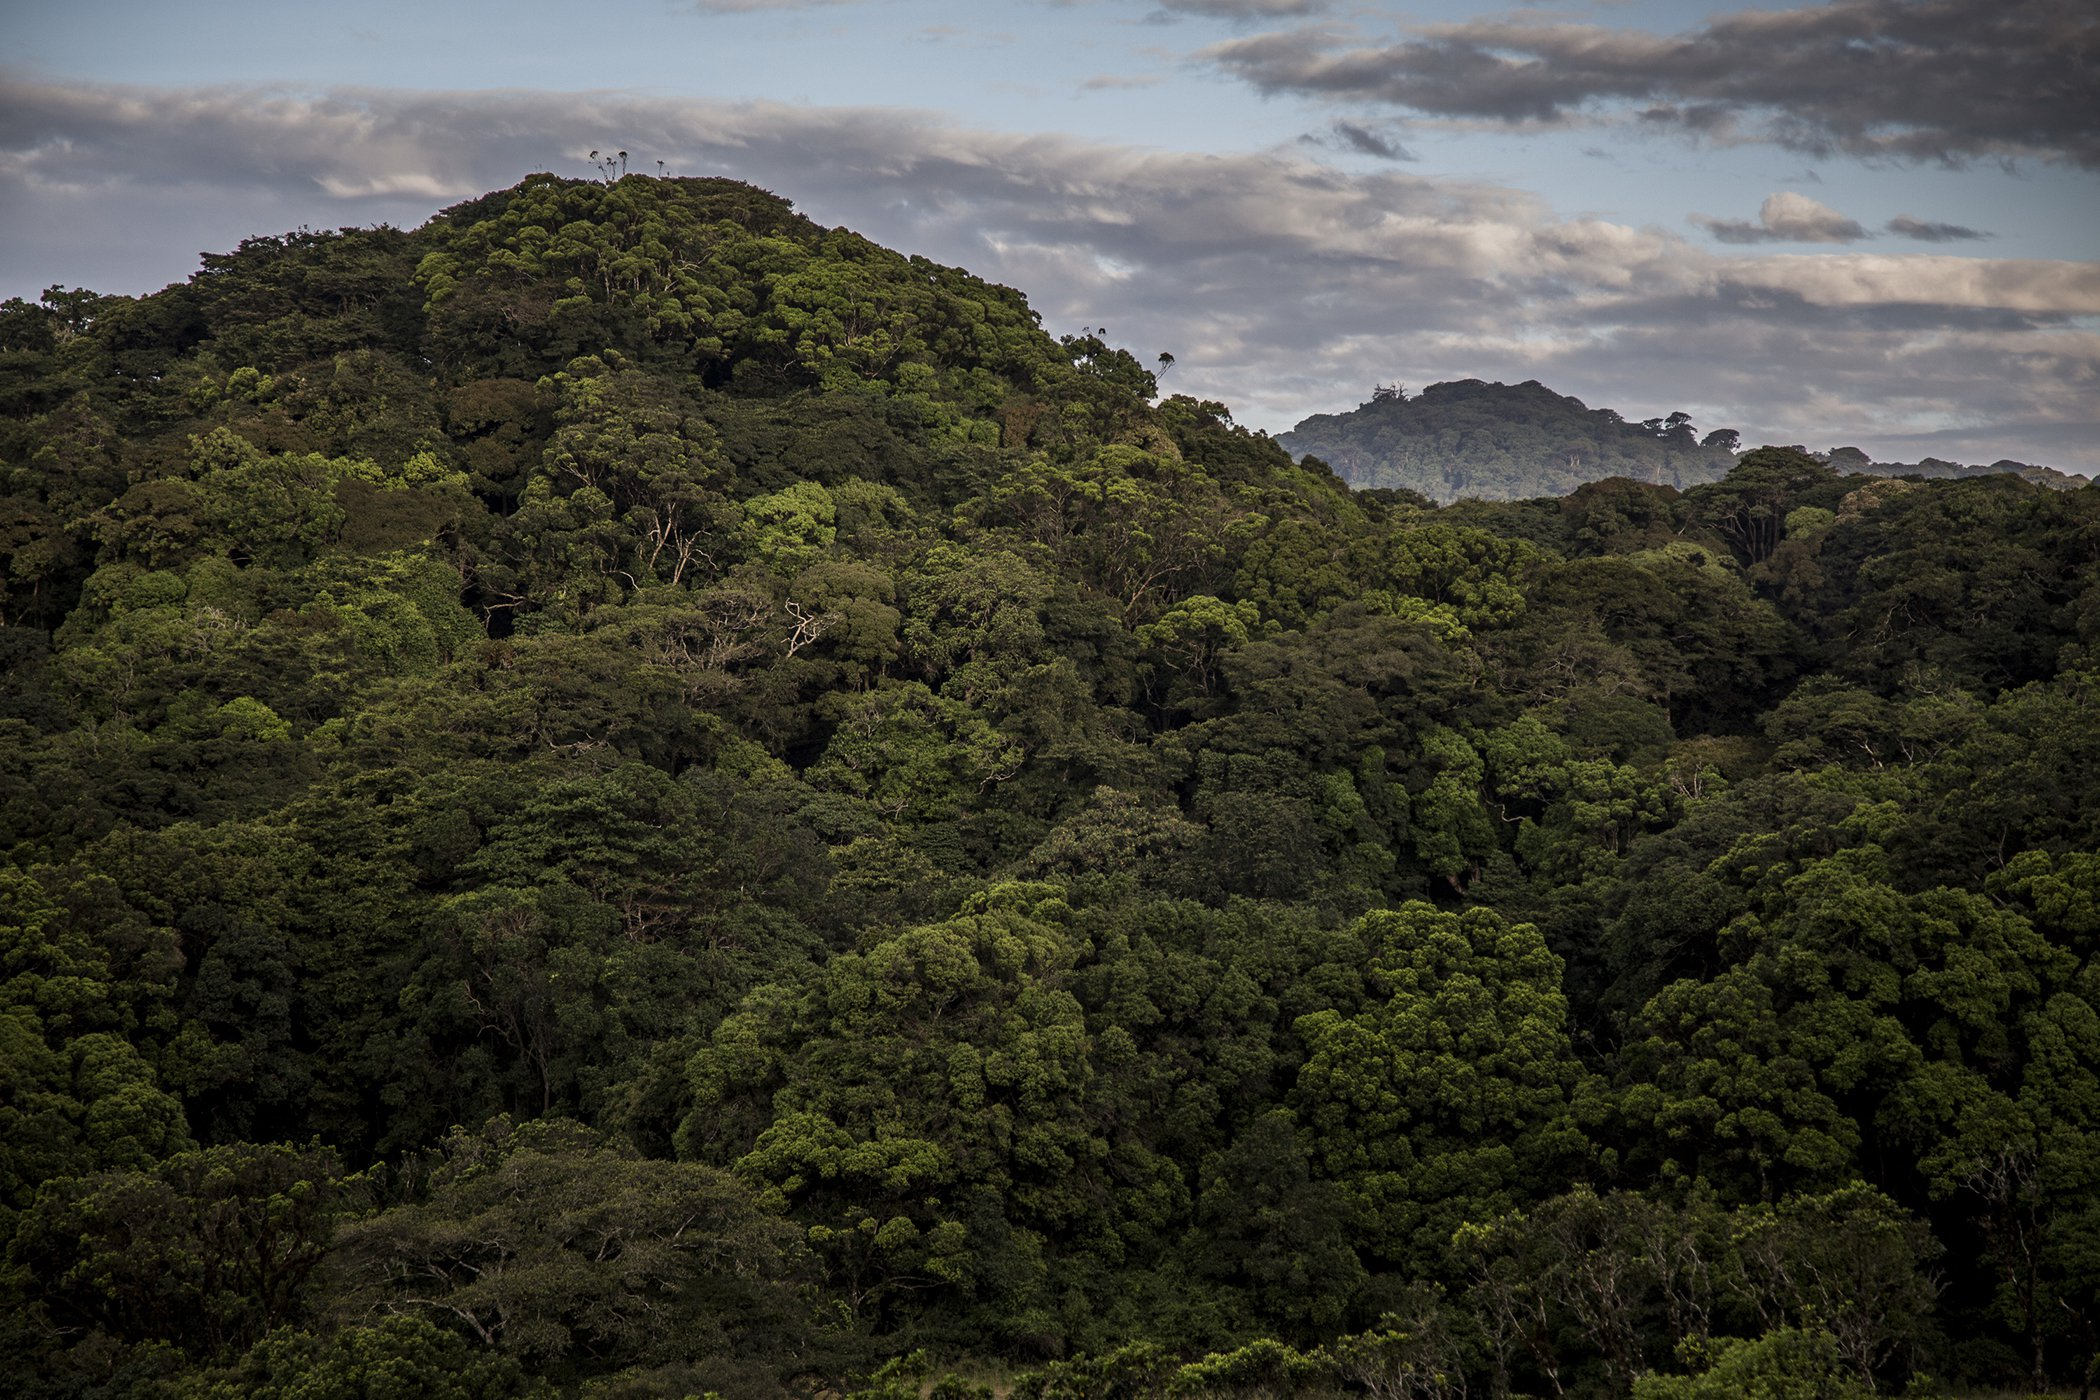 Chyulu Hills-Kenya-Conservation-Covid-19-Impacts-004.jpg